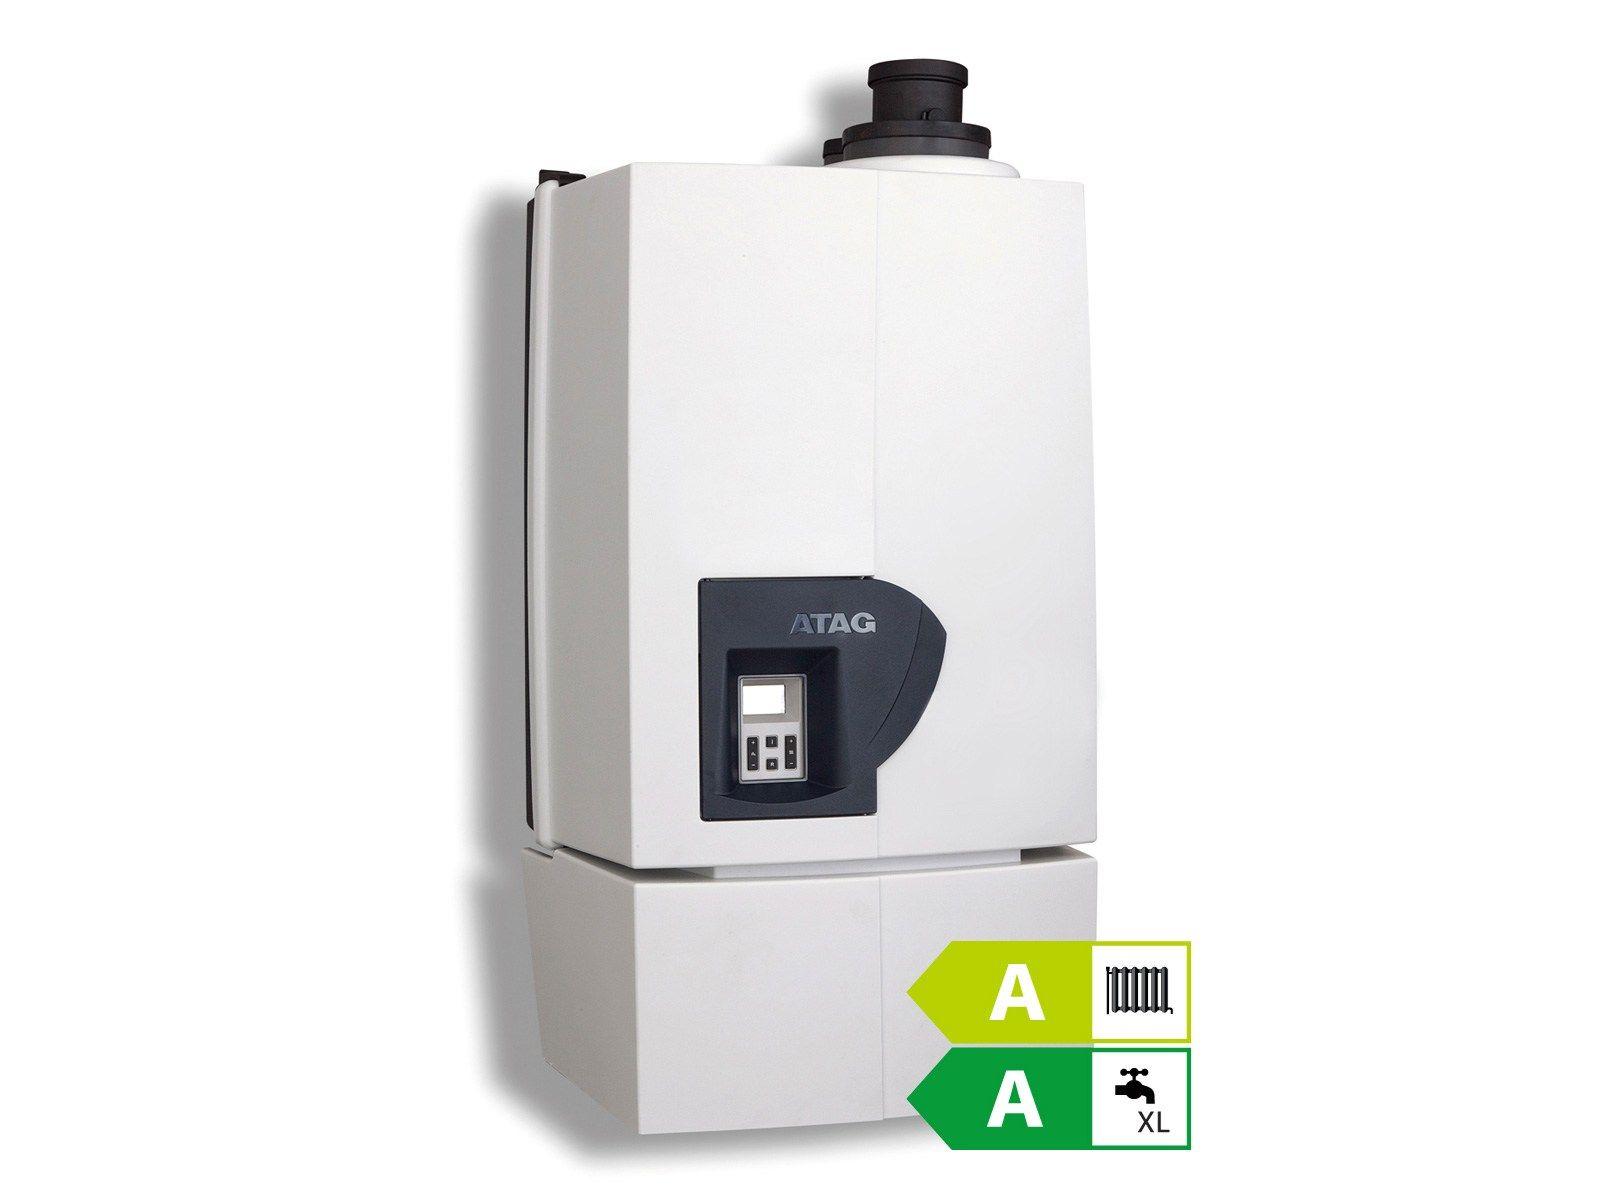 Caldaia a condensazione a serie by atag italia for Caldaia a condensazione